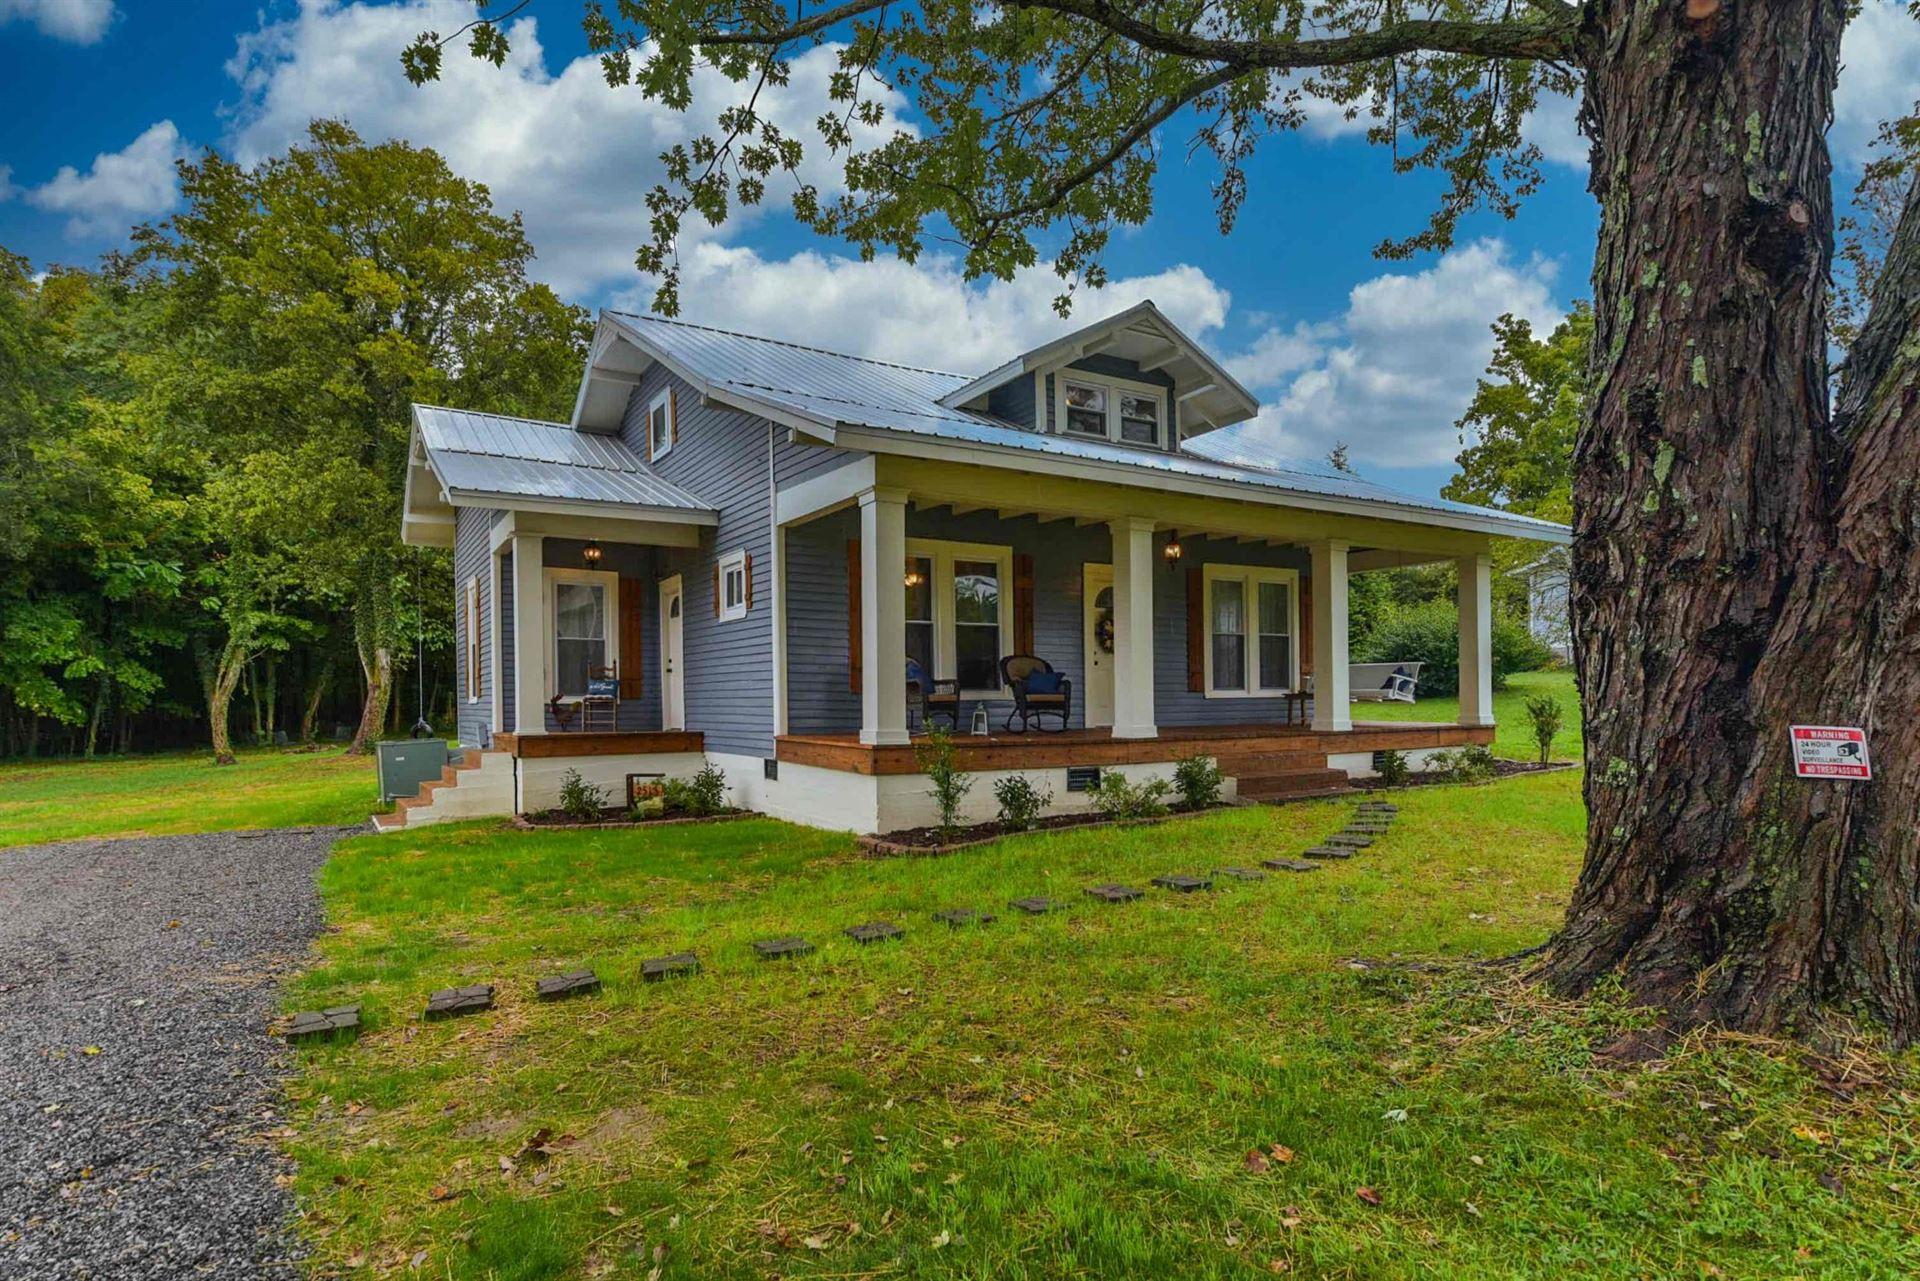 2515 Epperson Springs Rd, Westmoreland, TN 37186 - MLS#: 2290479